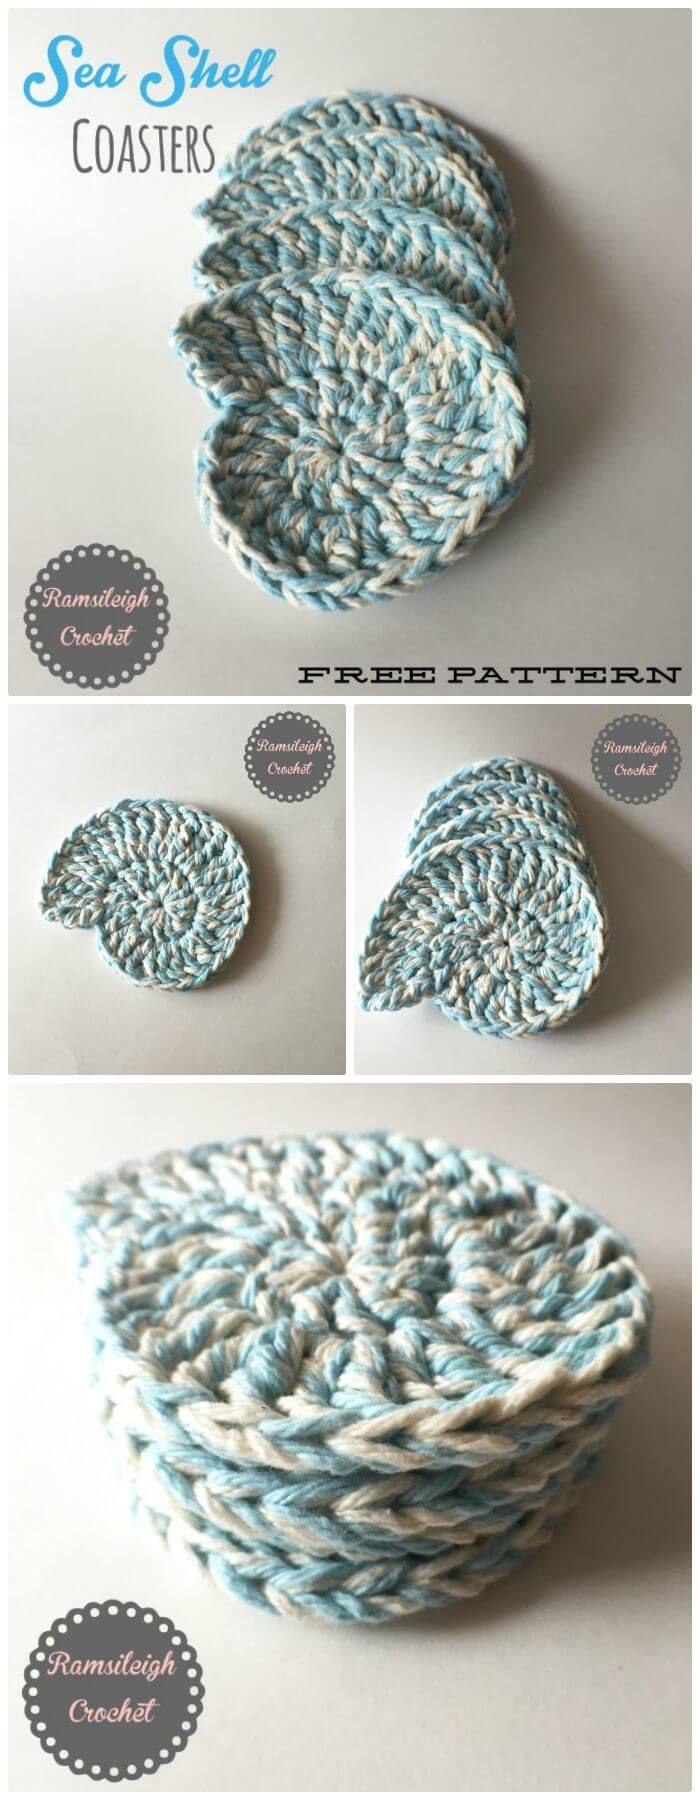 Mejores 103 imágenes de crochet en Pinterest | Patrones de ganchillo ...